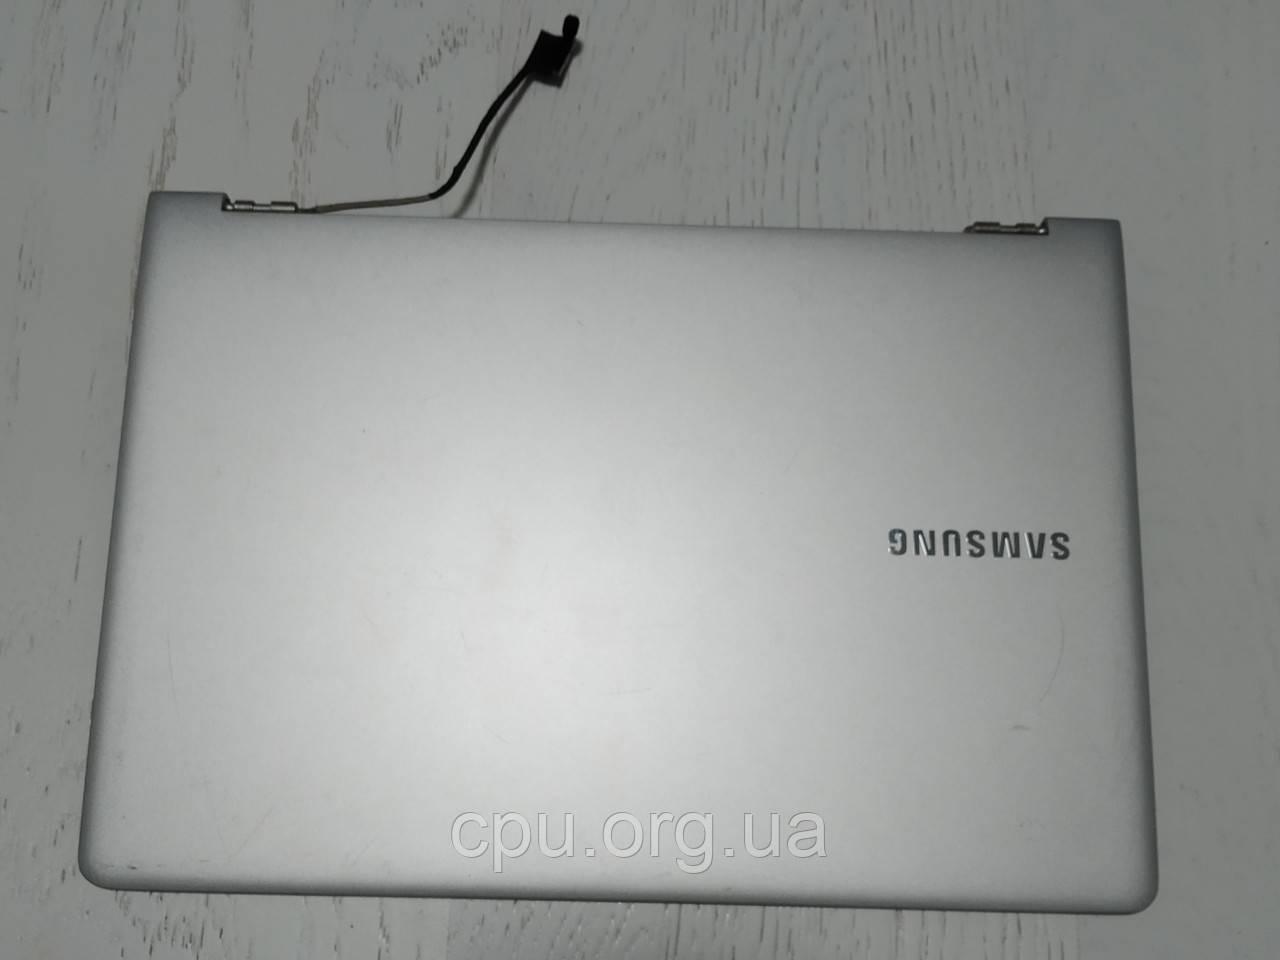 Samsung NP900X3D кришка і рамка матриці + шлейф + веб камера